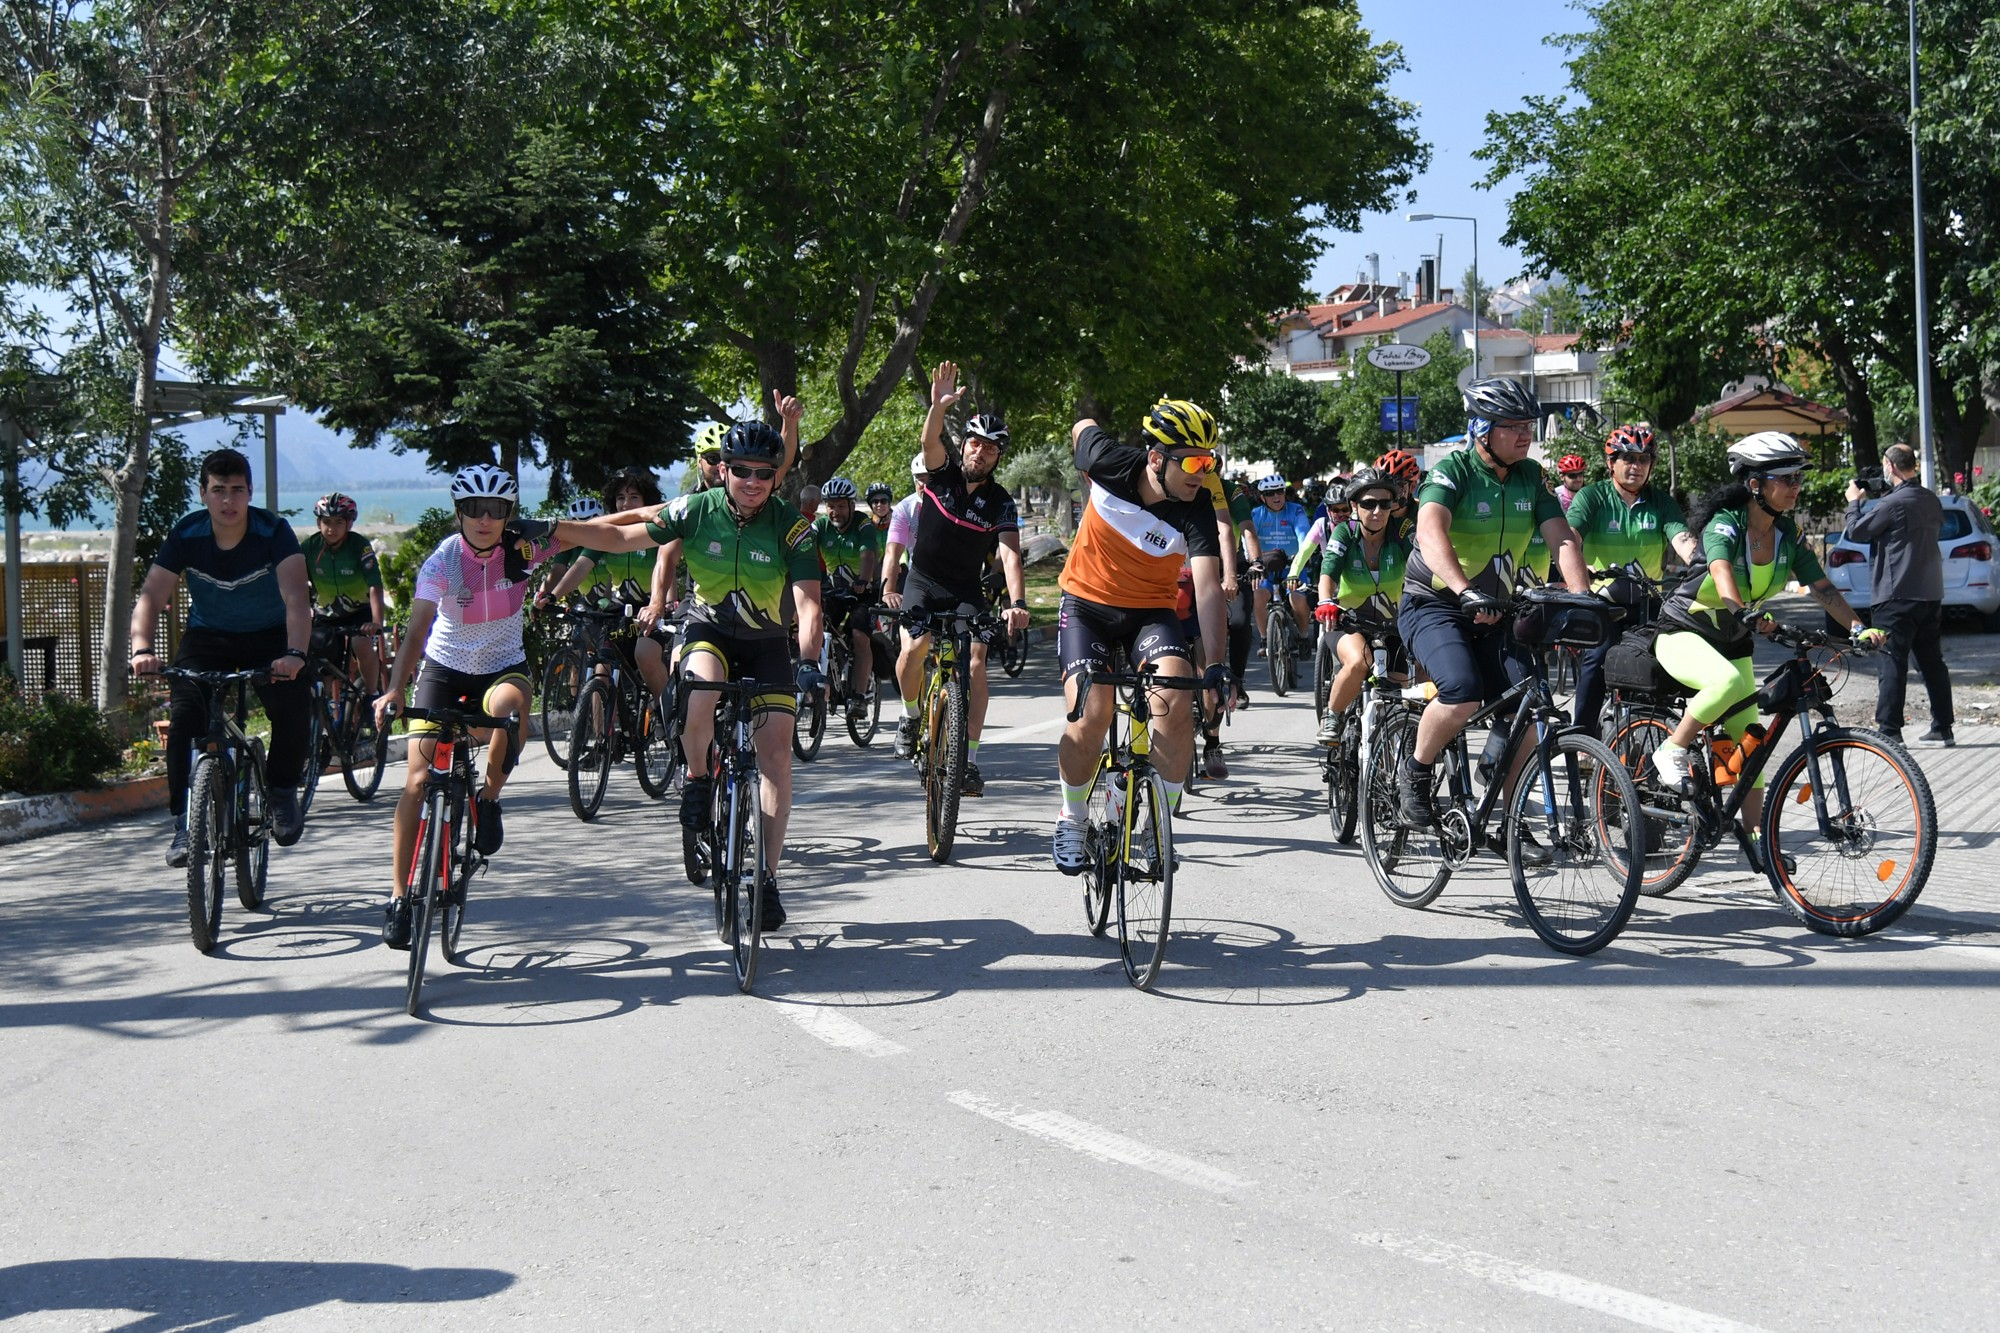 Isparta'dan başlayan bisiklet festivalinden en güzel kareler